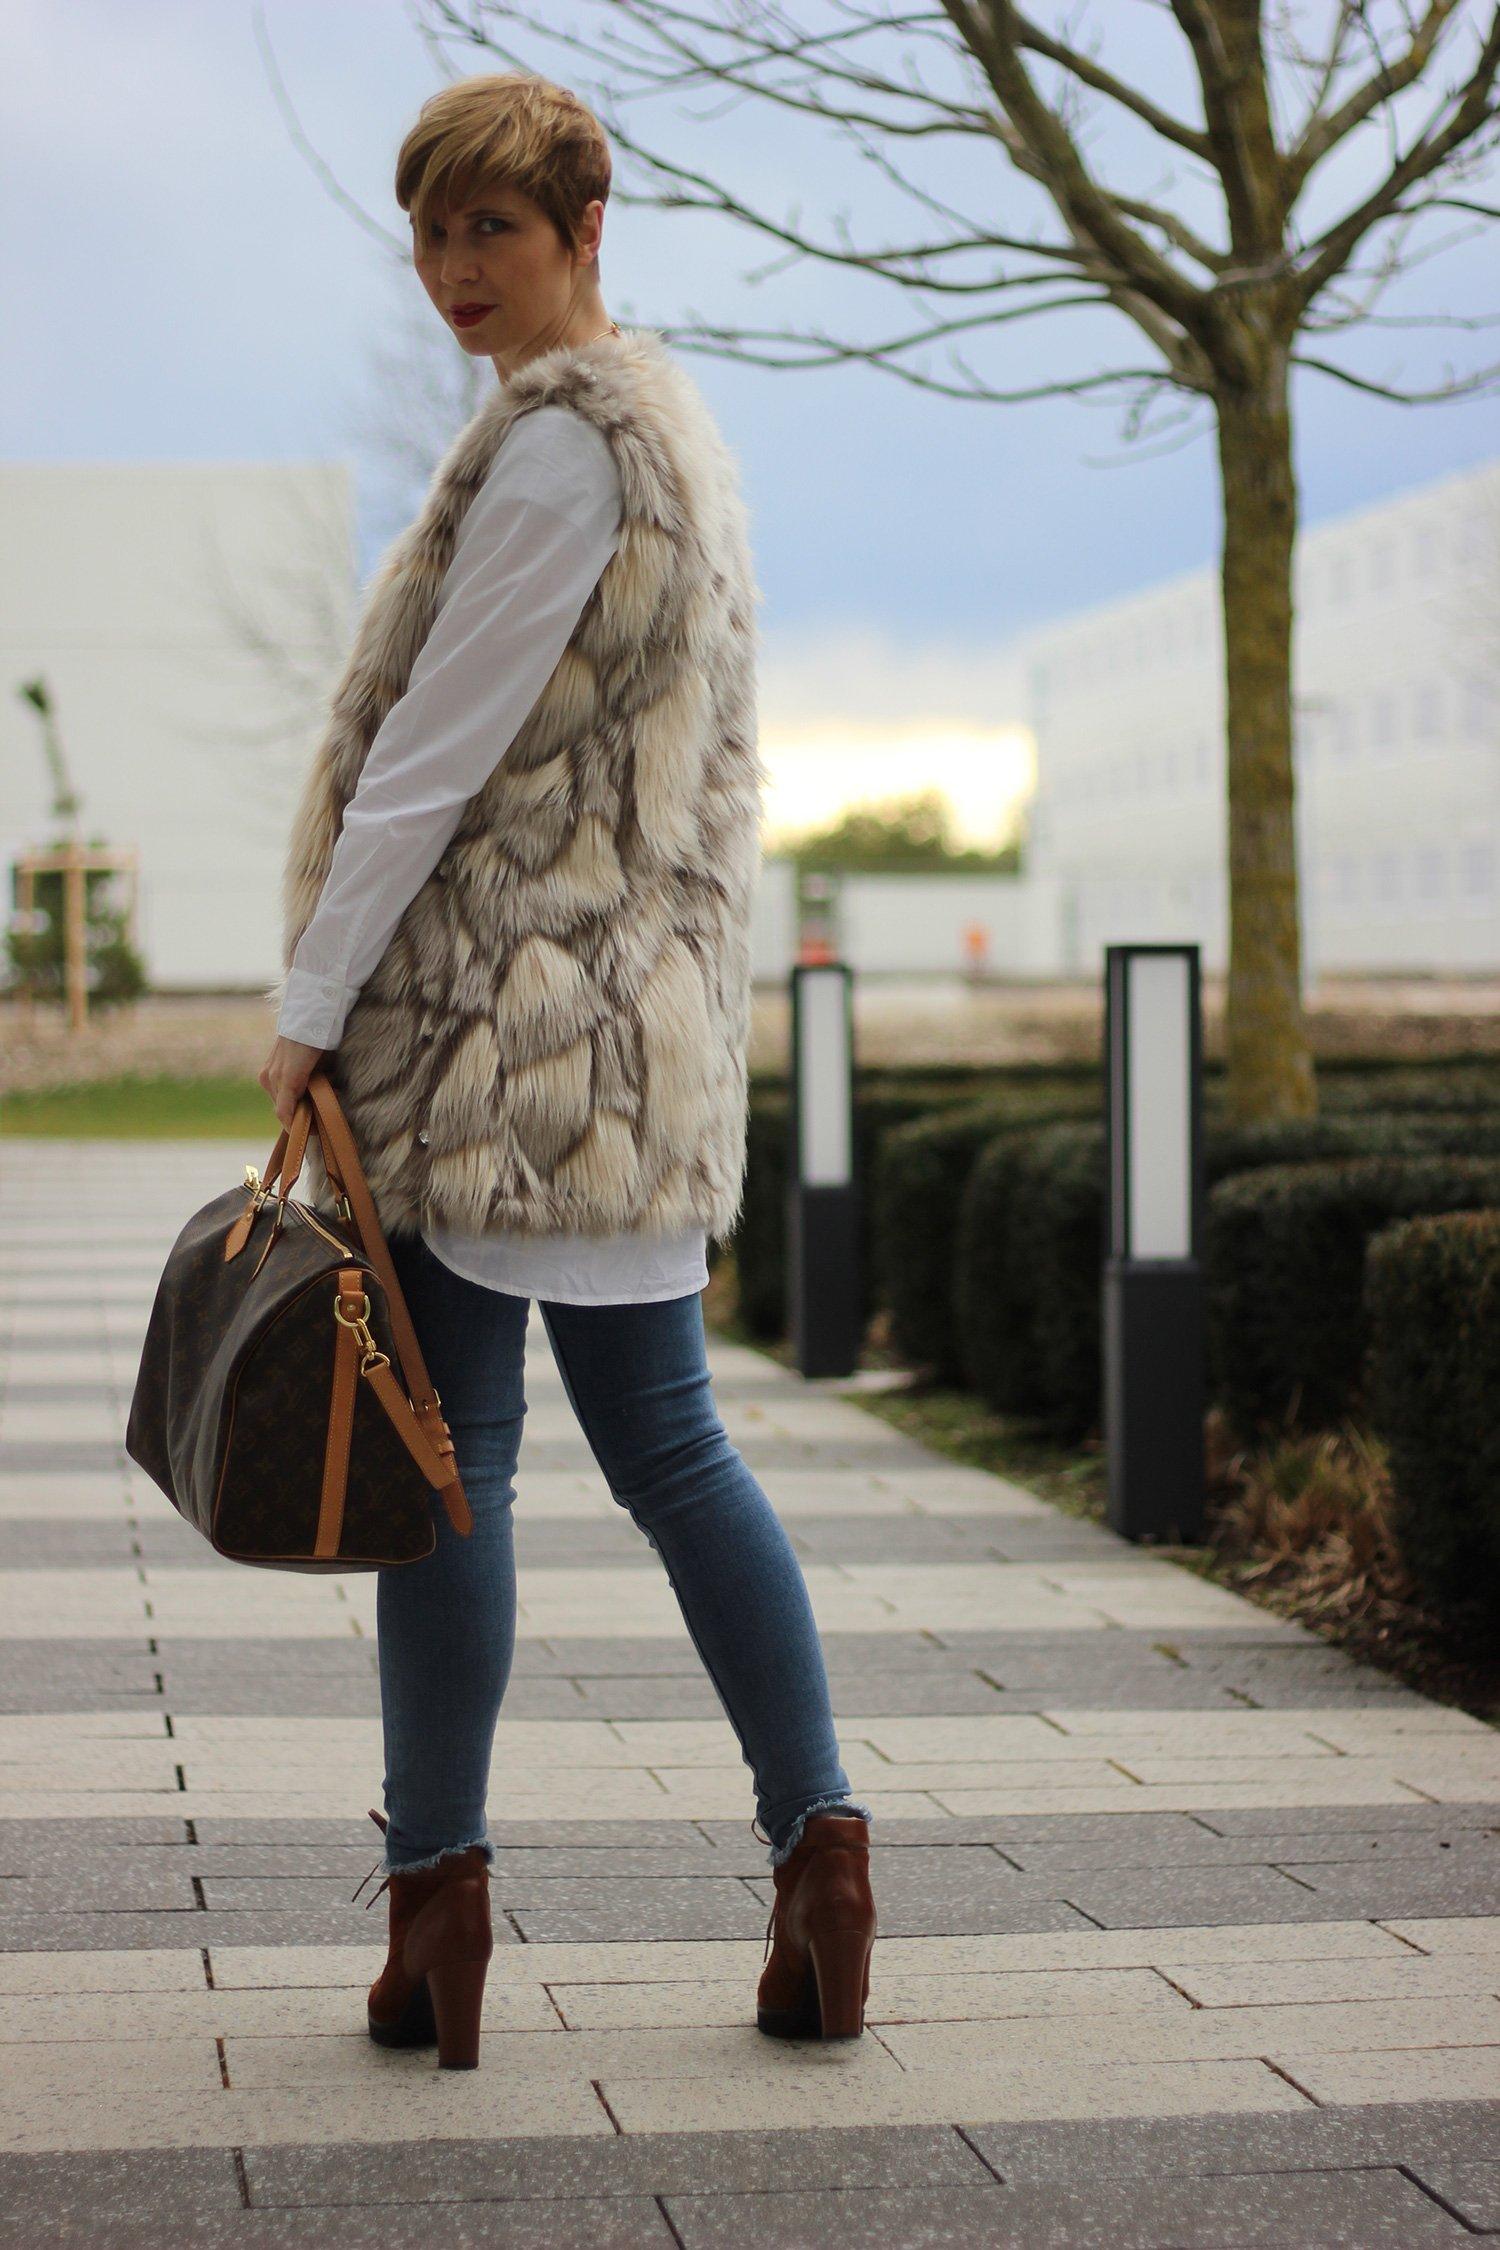 SoftRebel, Longbluse, Fakefur, Weste, Gadea-Schuhe, Allsaints, Jeans, Louis Vuitton, Tasche, Lieblingsladen, Schal, Goldschmuck